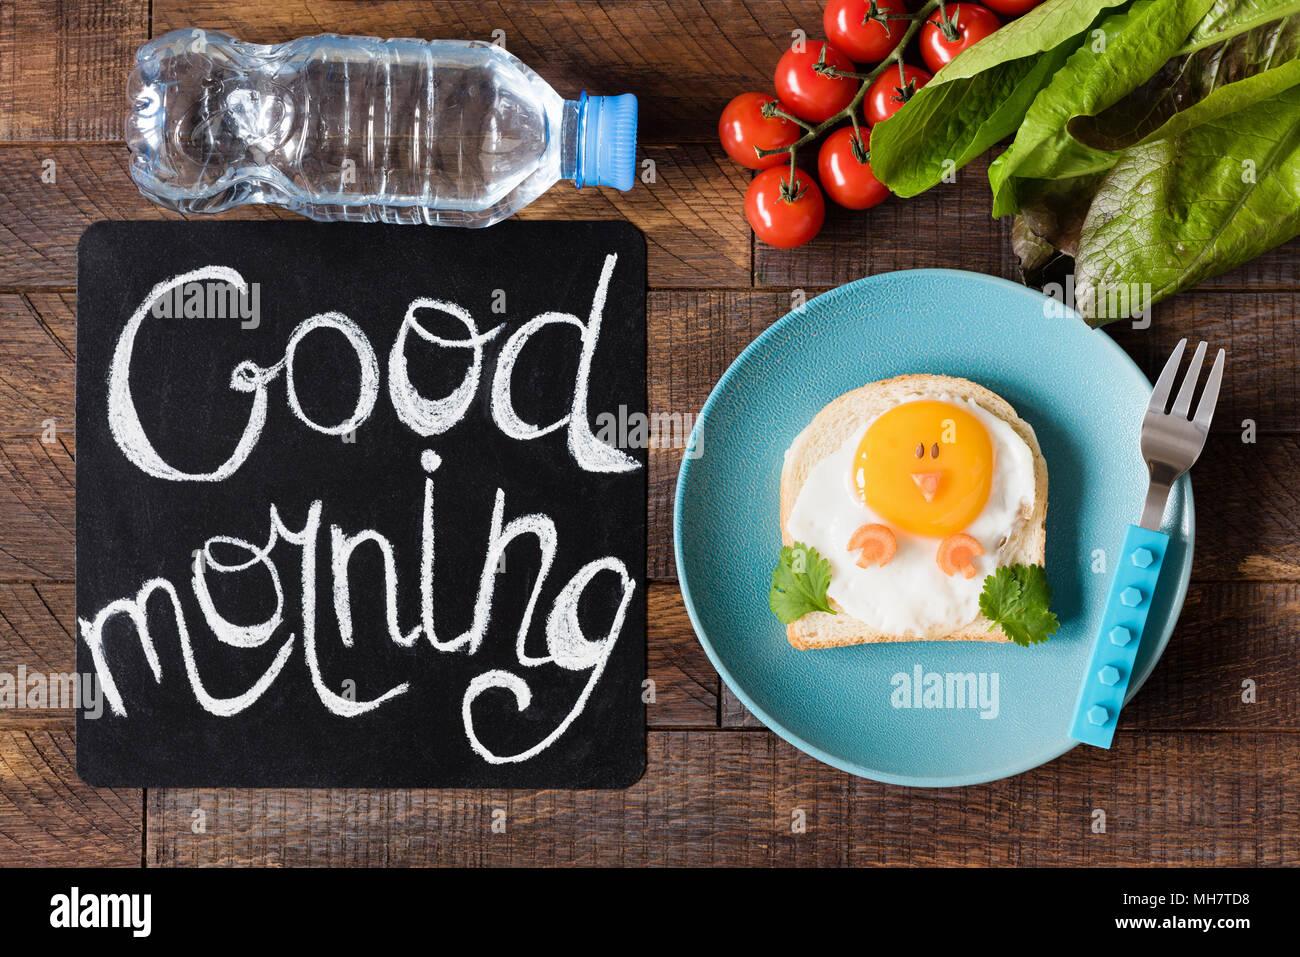 Good Morning Breakfast For Kids. School Lunch Chicken Sandwich Creative Food Art Sandwich. Cute Funny Chicken Shaped Toast For Children. Good Morning  Stock Photo